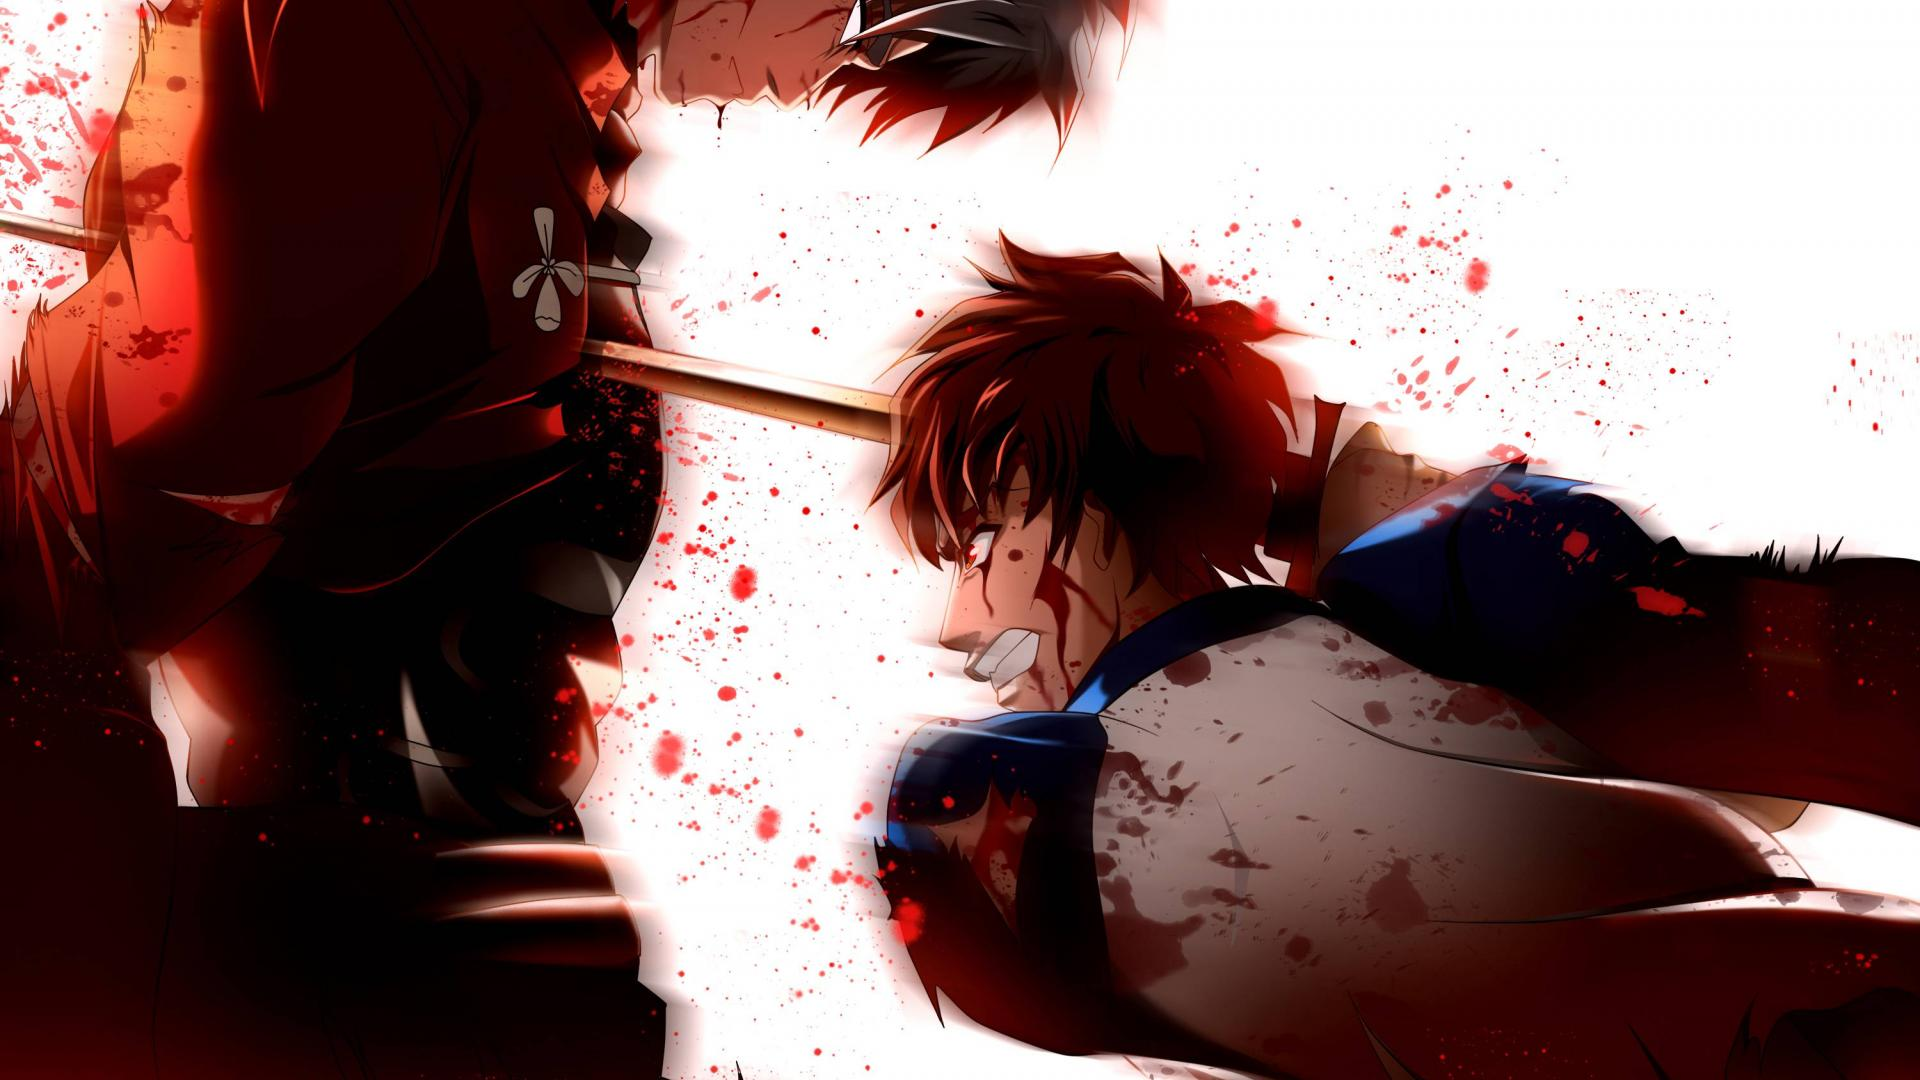 Fate Stay Night Wallpaper Archer 21 Desktop Background